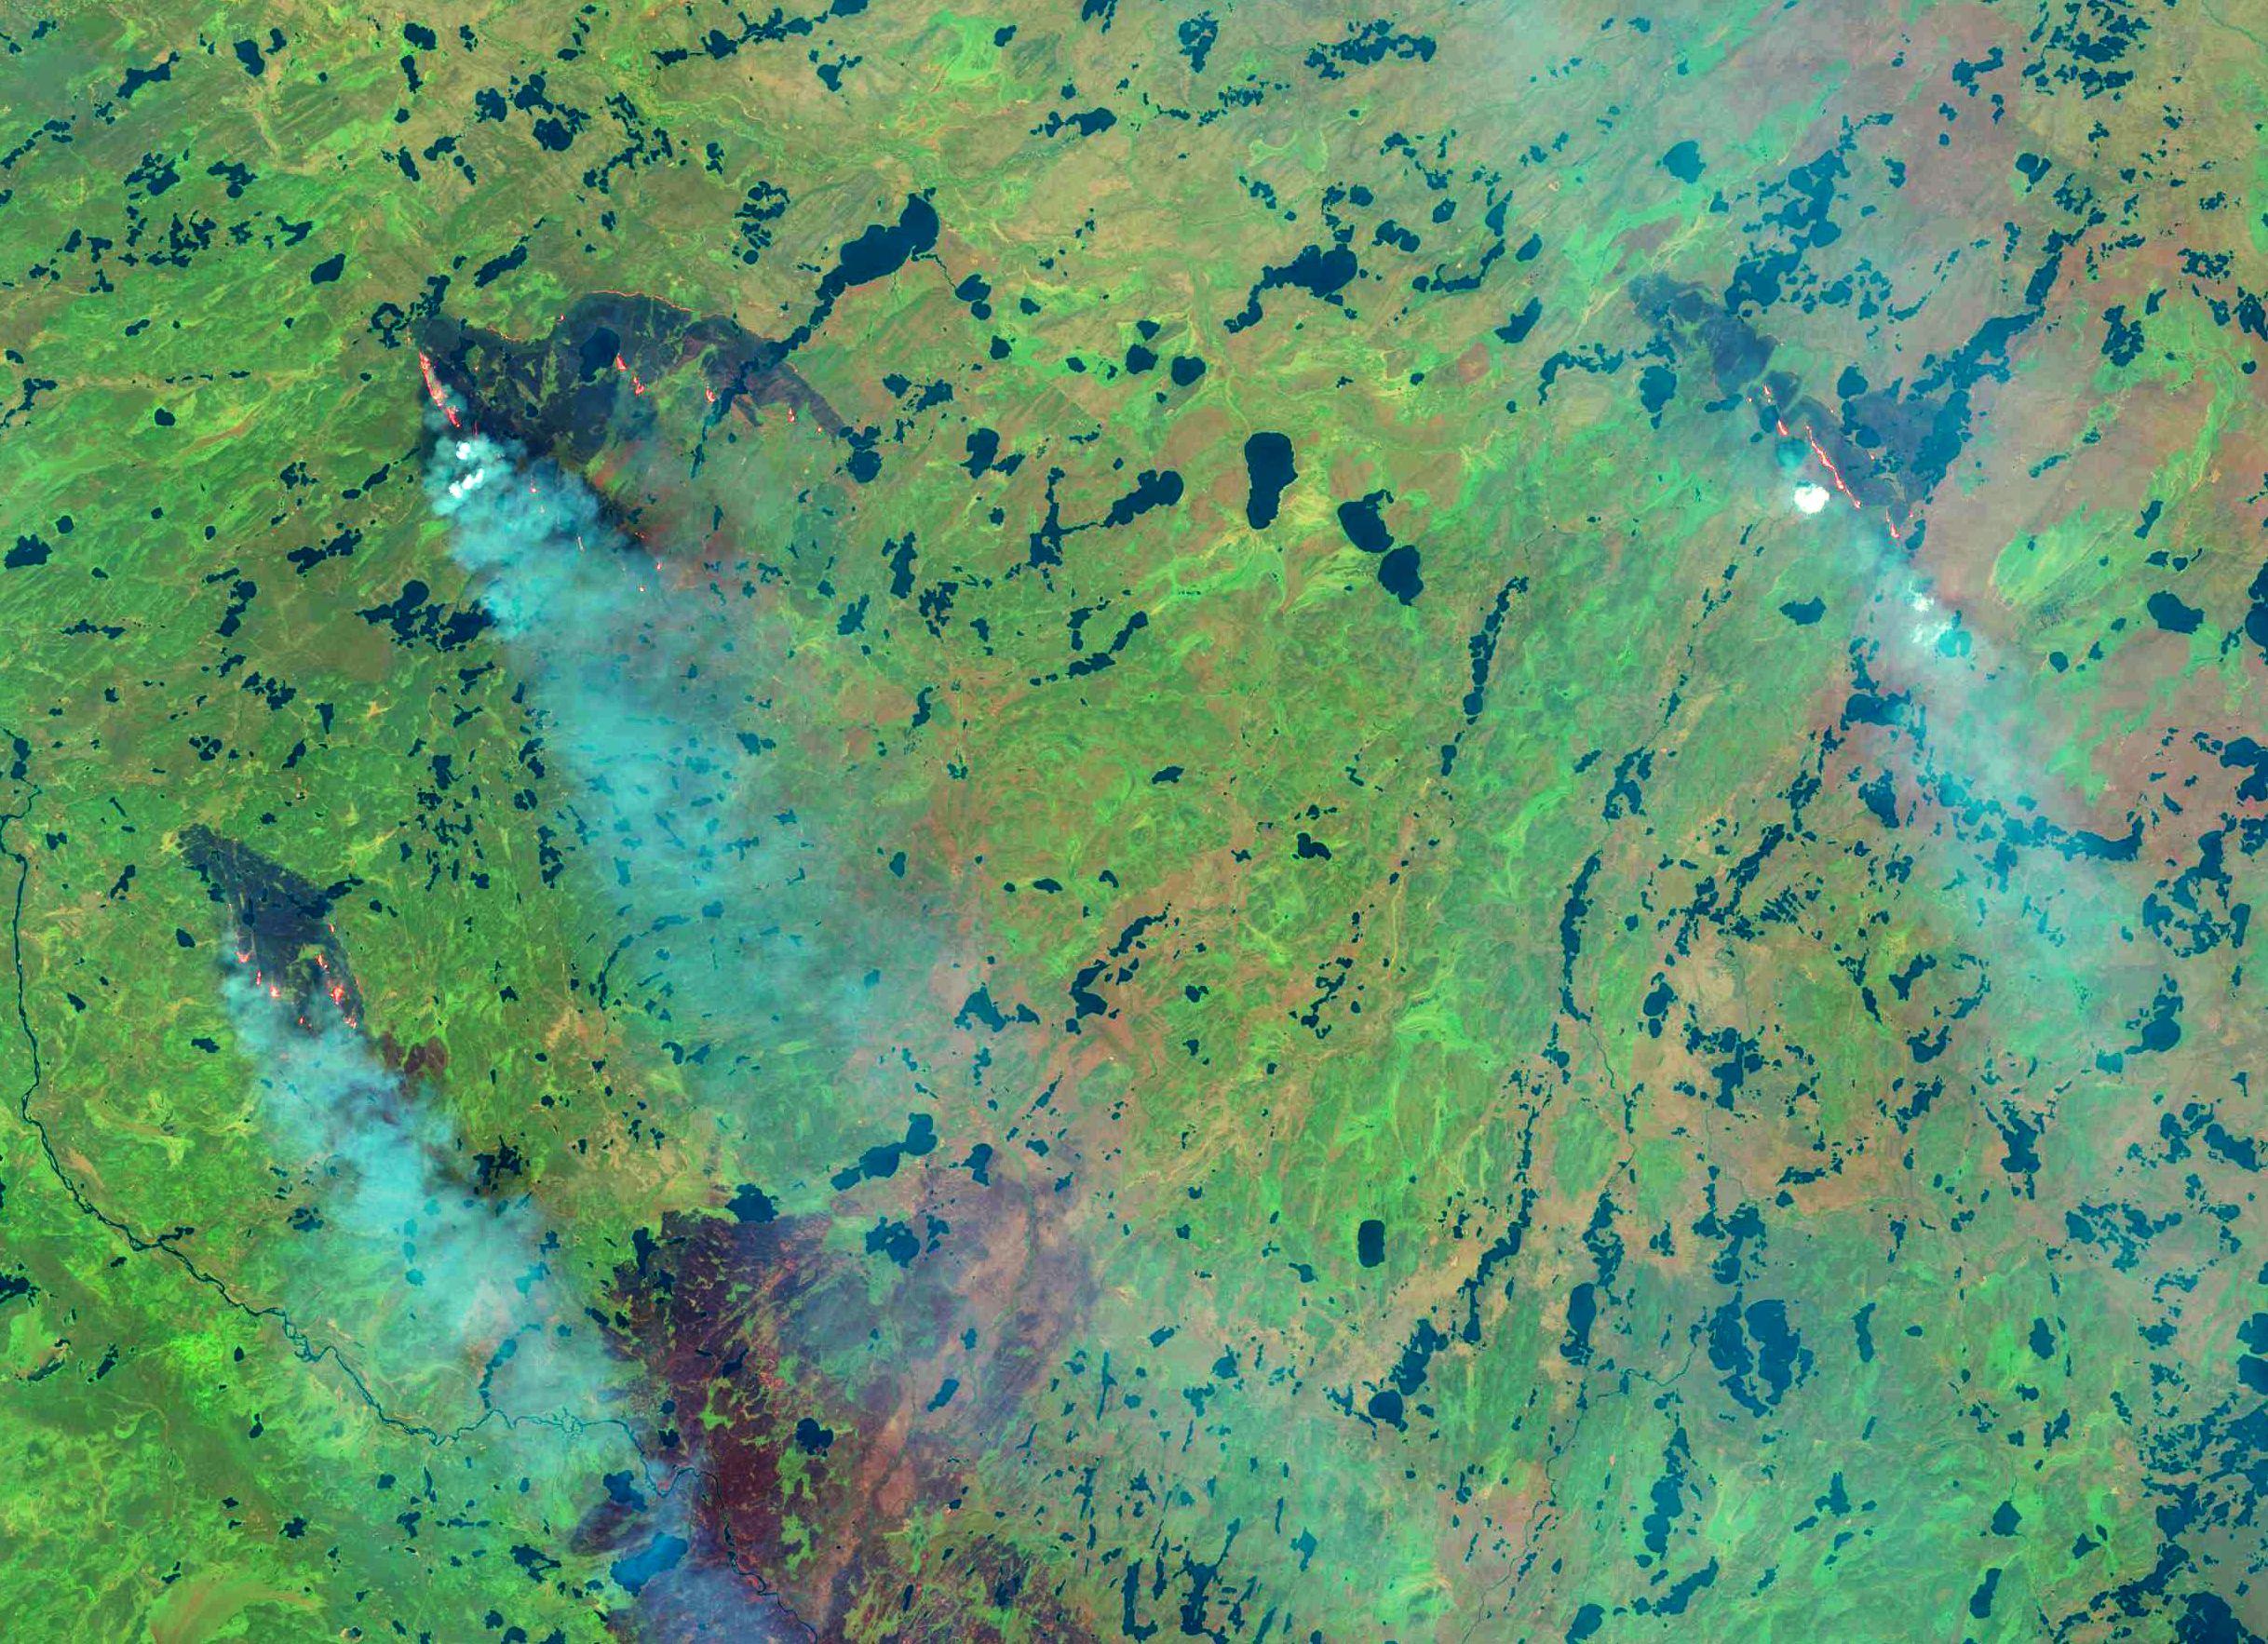 Incendies - Feux - Fire - Canada - Alberta - Saskatchewan- Landsat 8 - OLI - satellites - 29 Juin 2015 - USGS